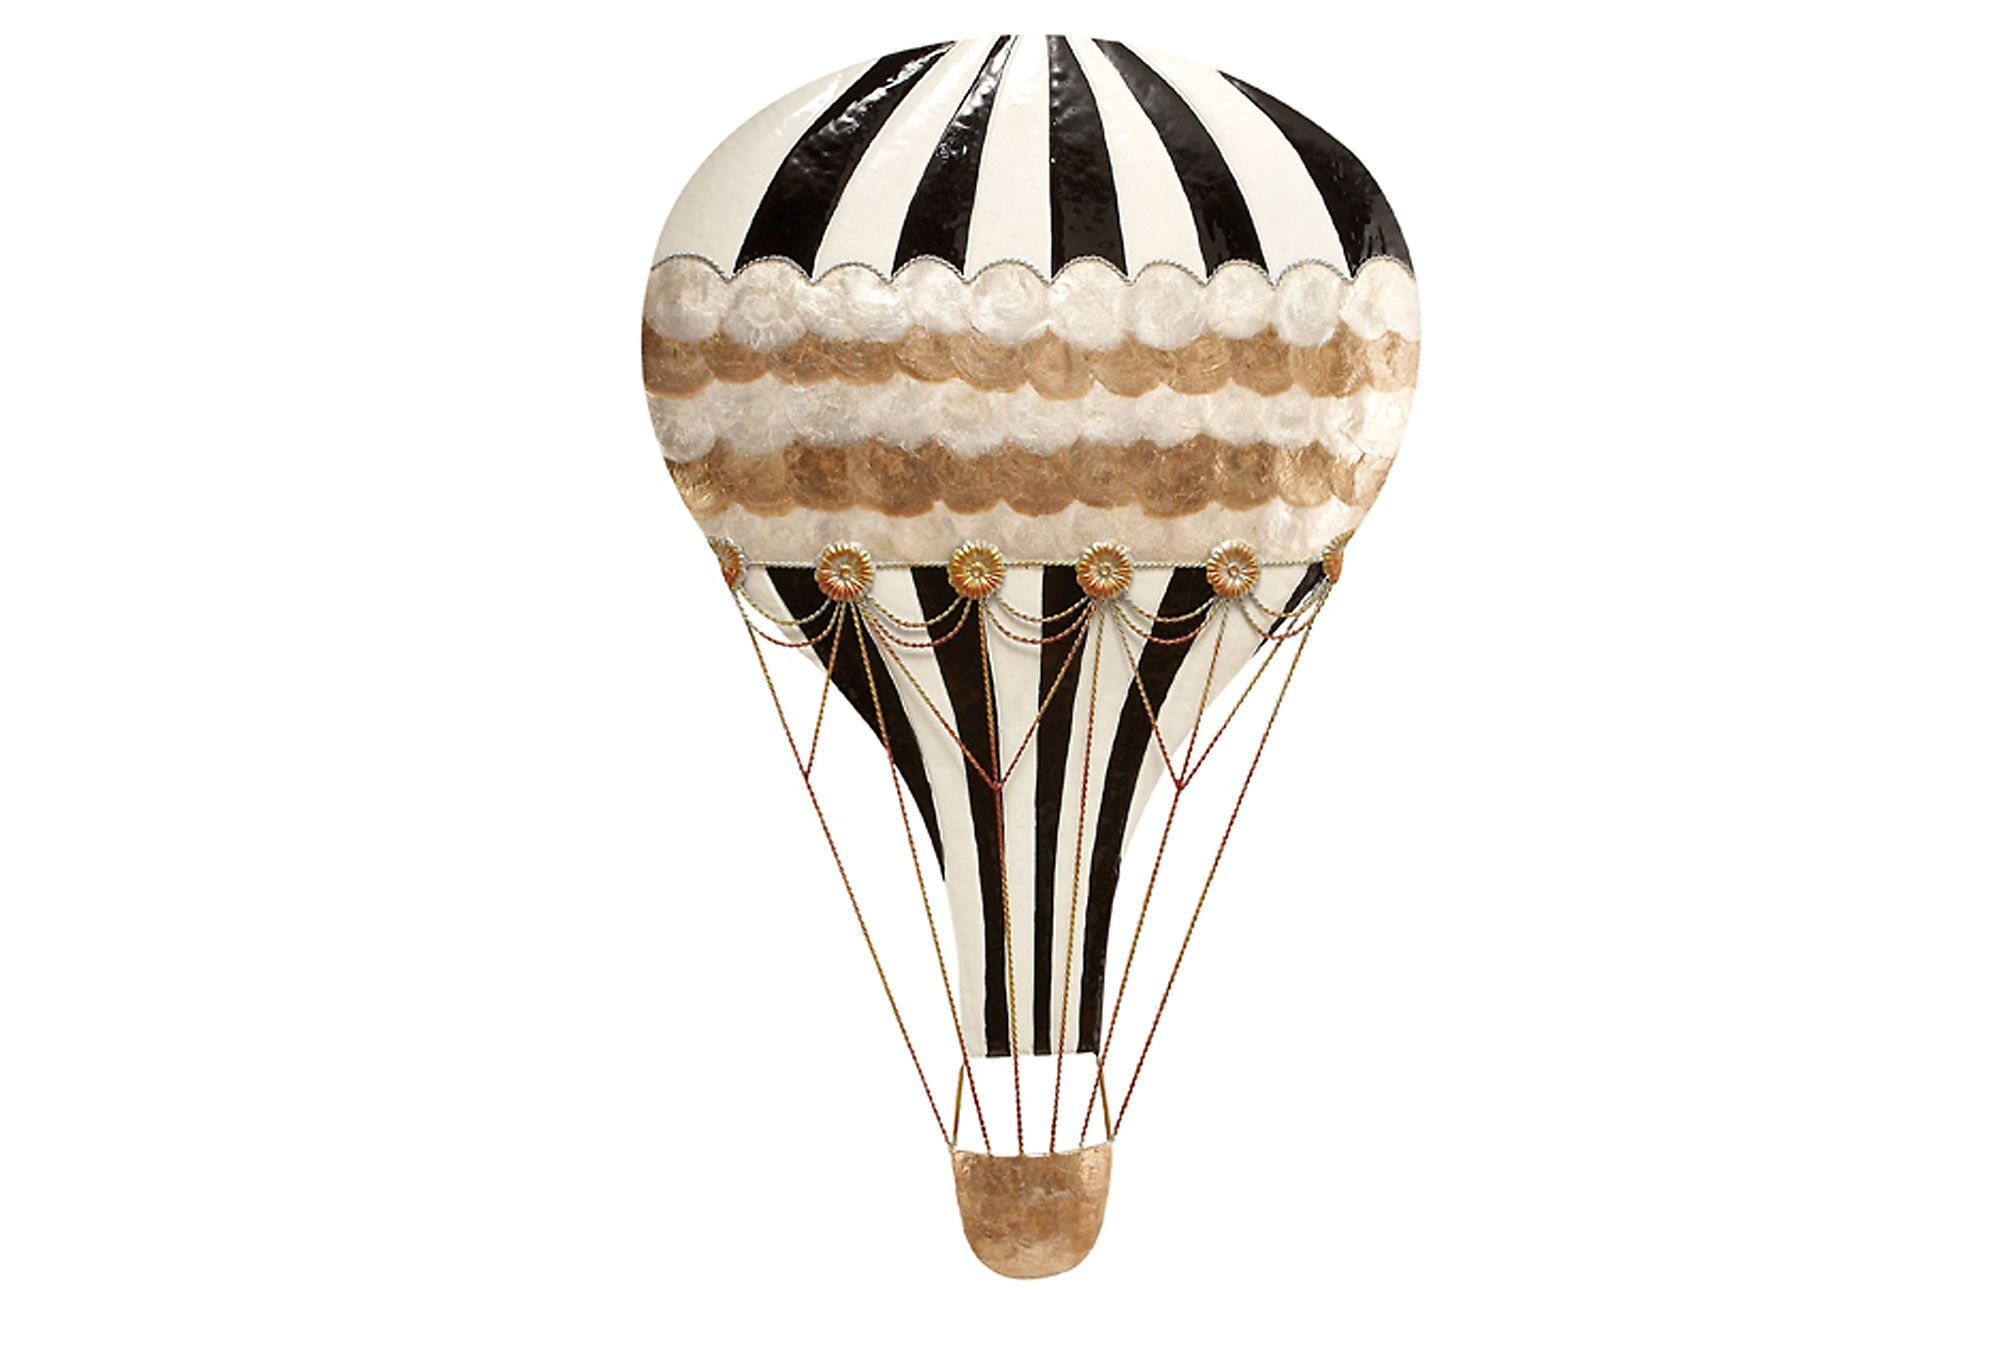 Hot Air Balloon Wall Decor This Is Sooo Cute Great For A